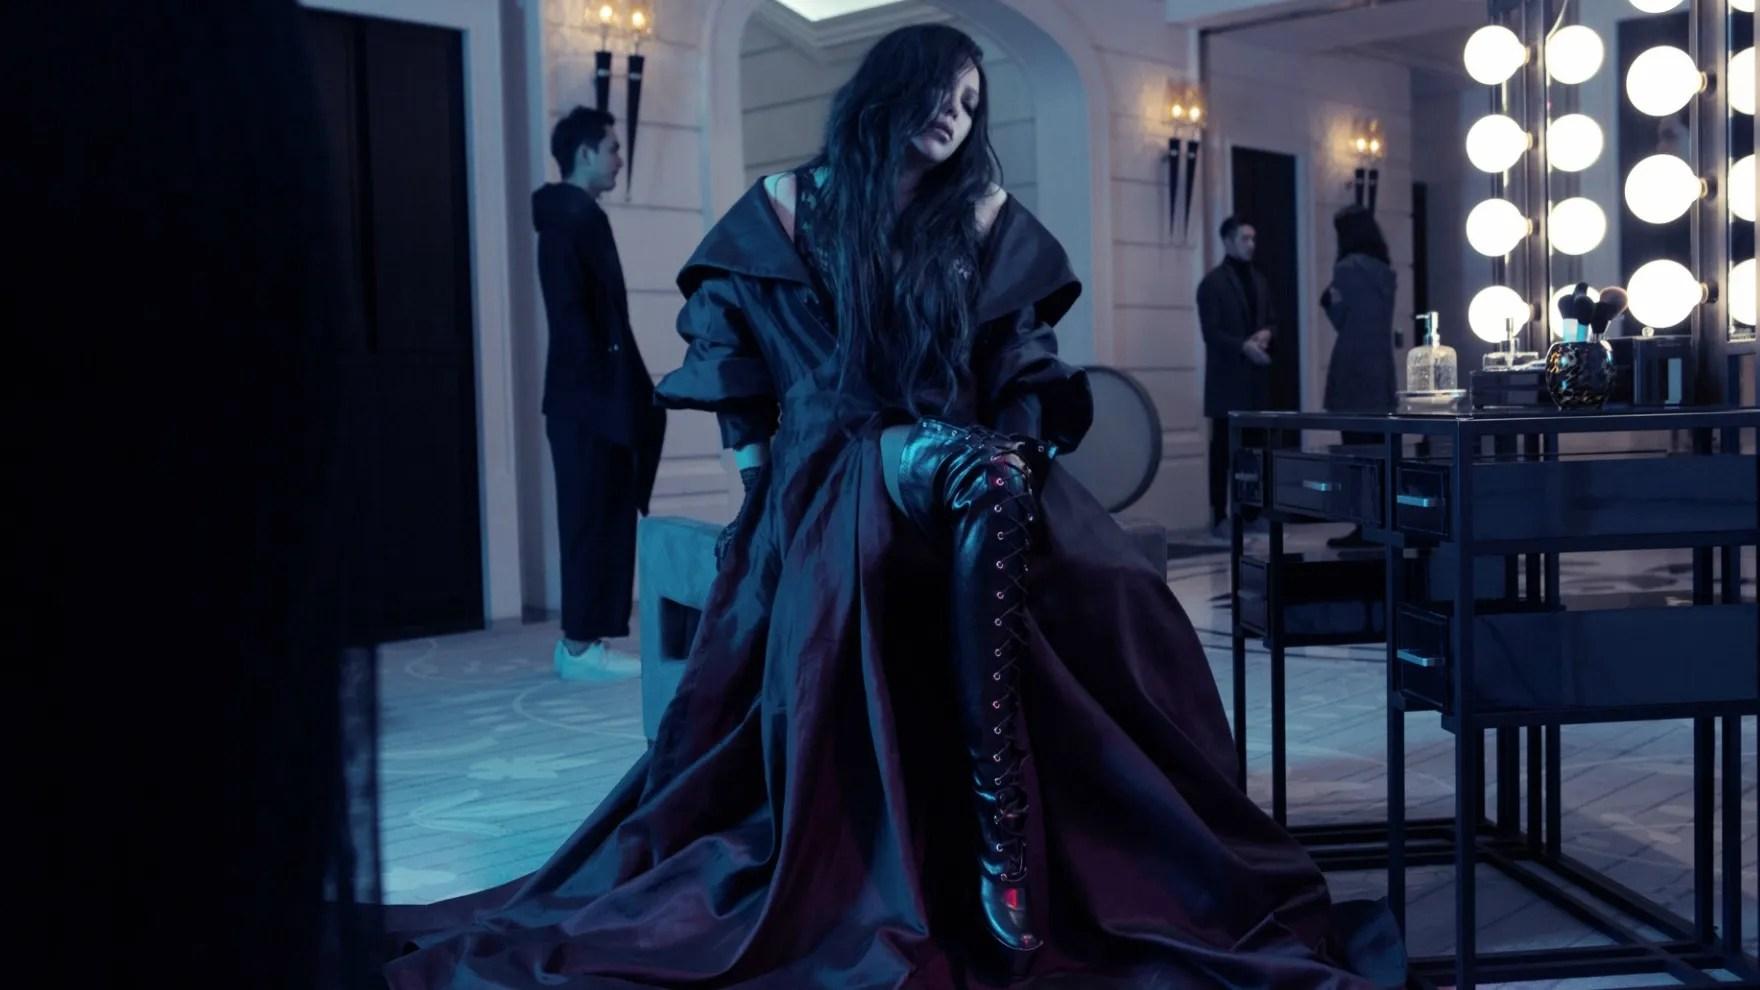 aMEI張惠妹新專輯《偷故事的人》,回歸純粹的歌手身分 | Vogue Taiwan